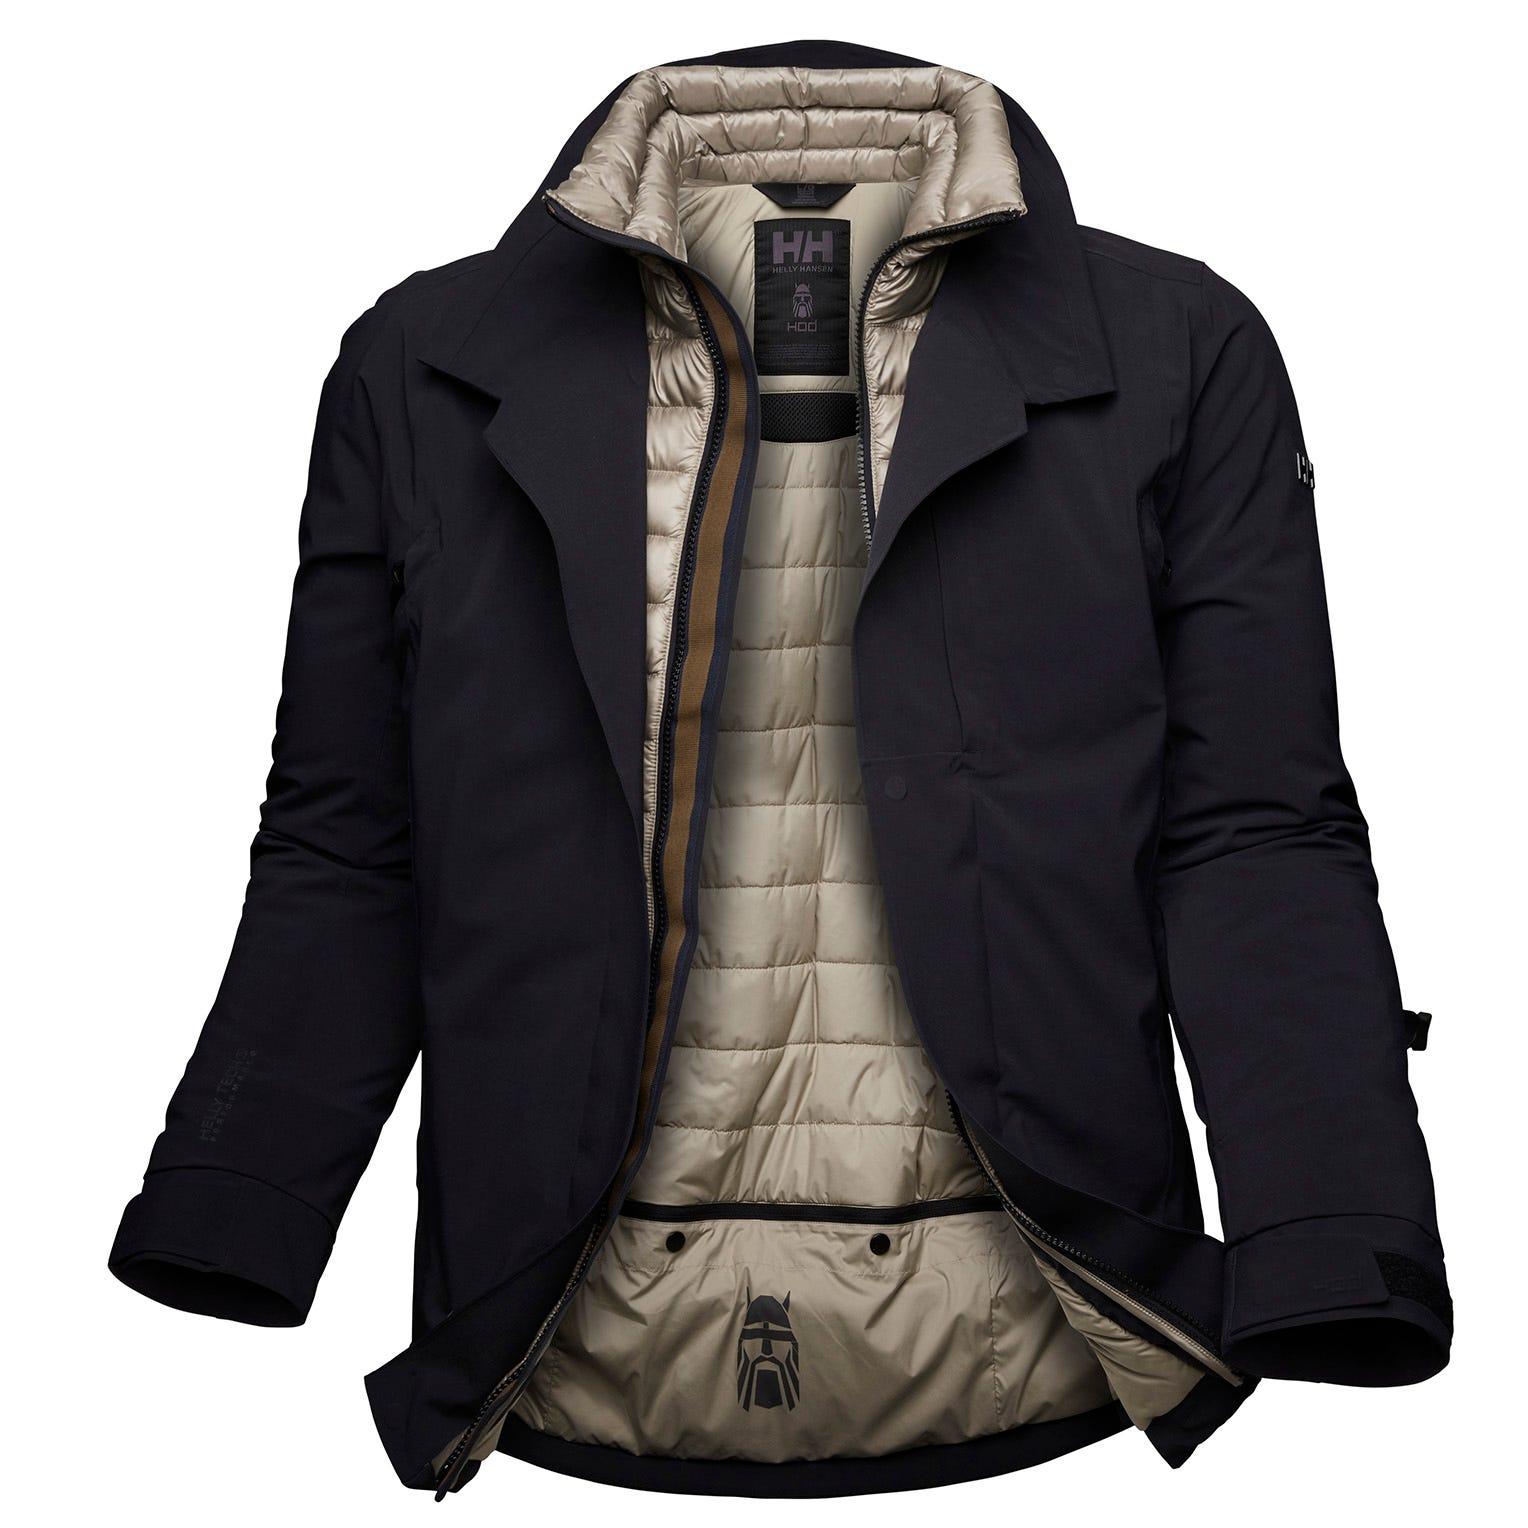 Helly Hansen Icon 3.0 Jacket Mens Black L